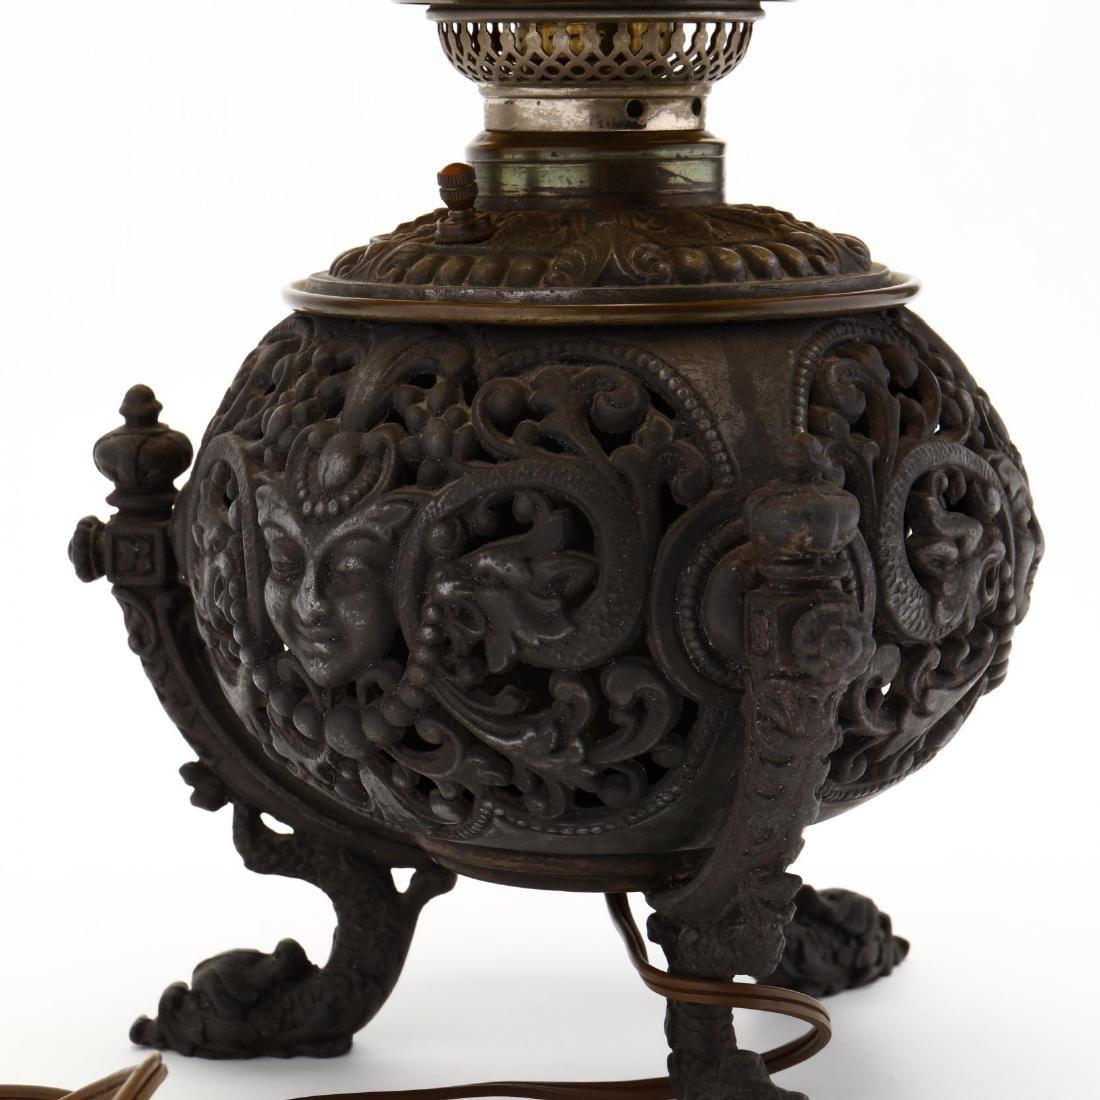 Renaissance Revival Mirror and Oil Lamp - 5